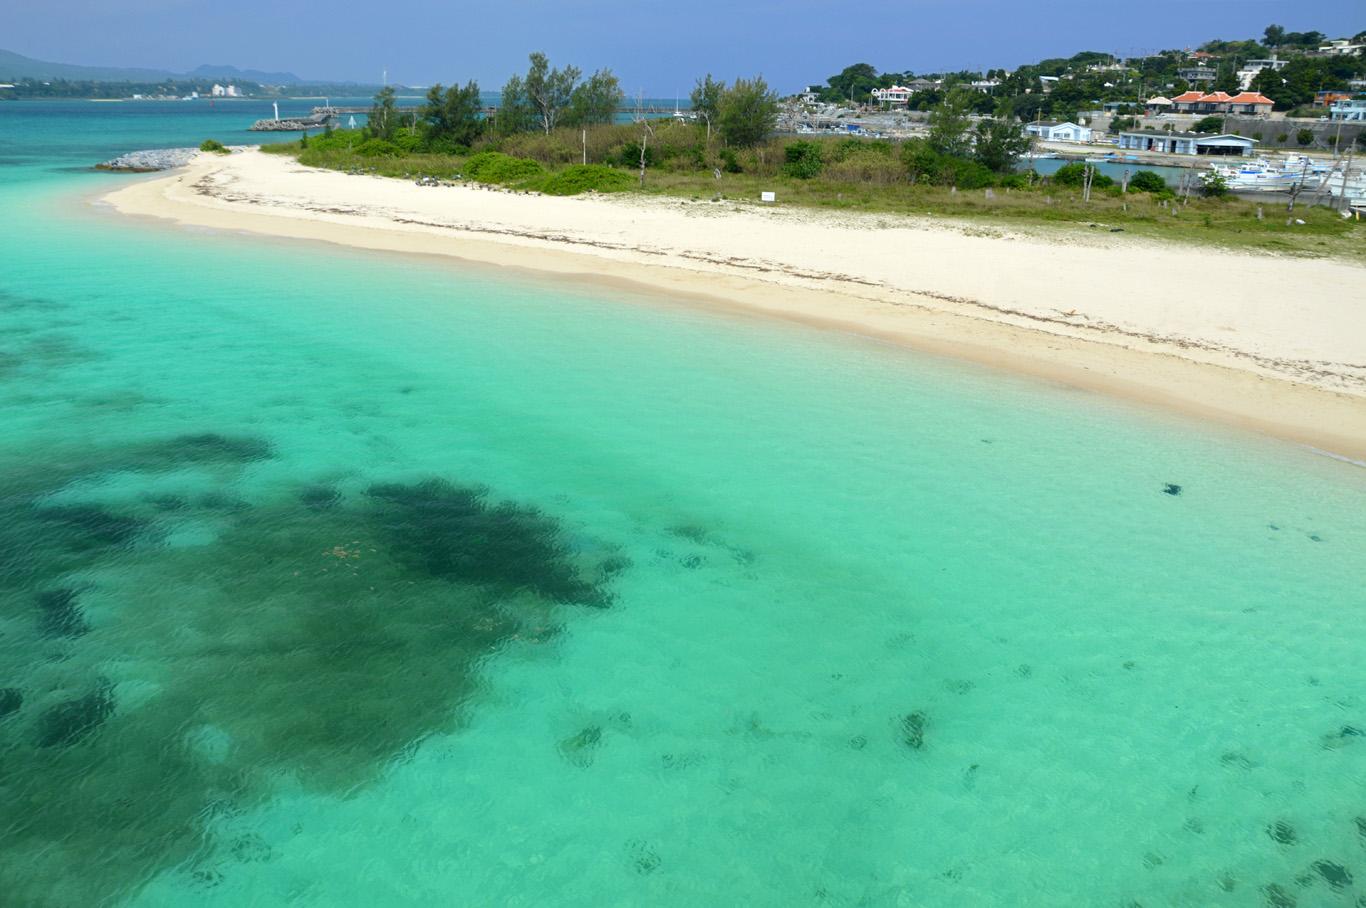 Beach in Okinawa